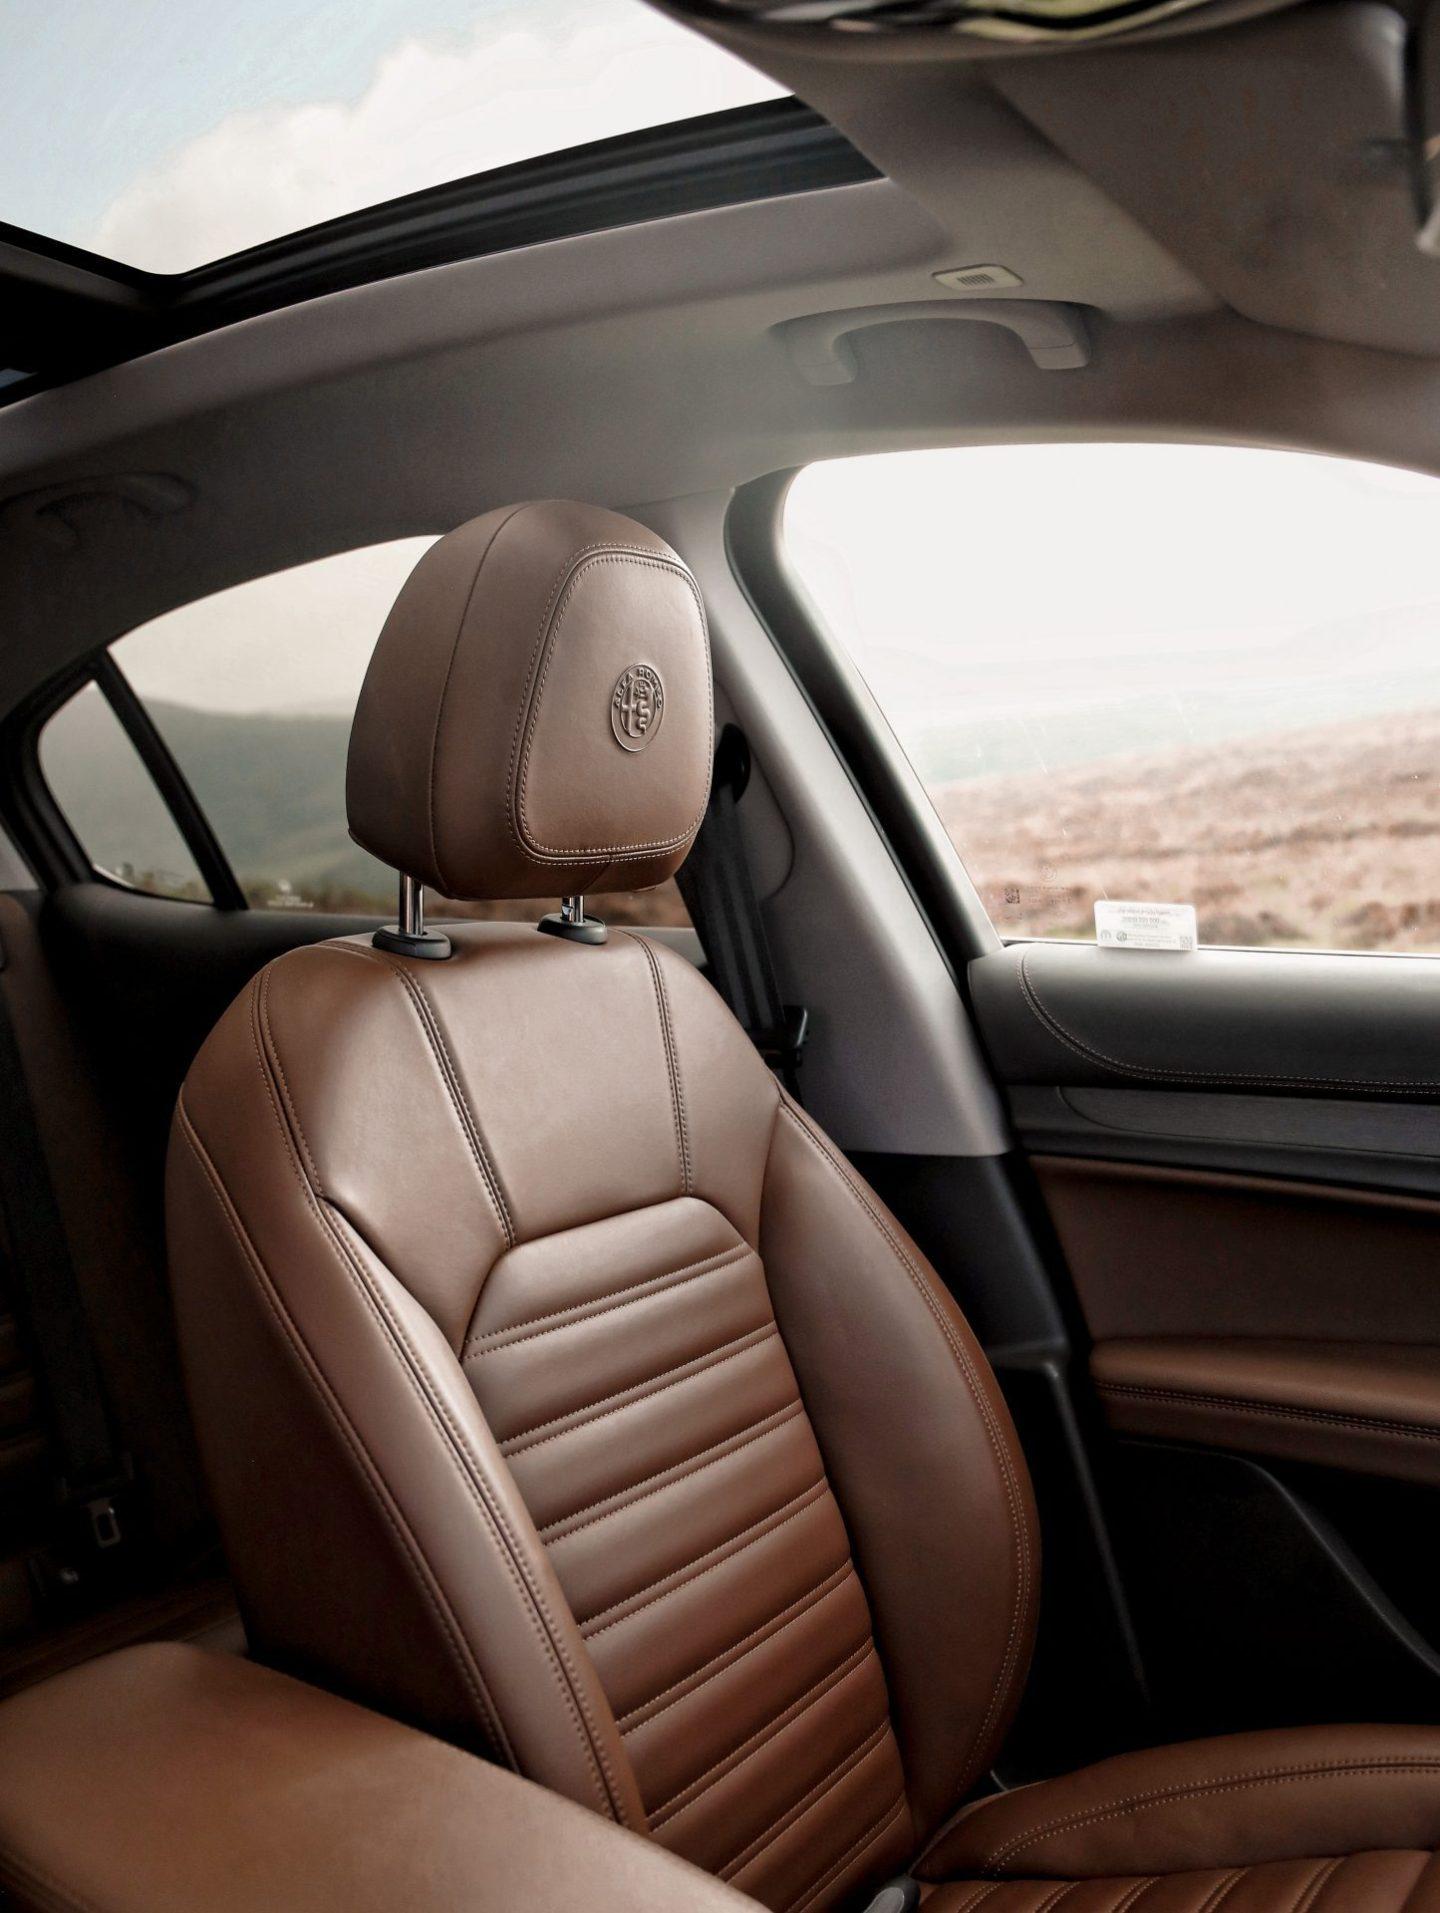 Alfa Romeo Stelvio Review Car SUV Family Car Interior